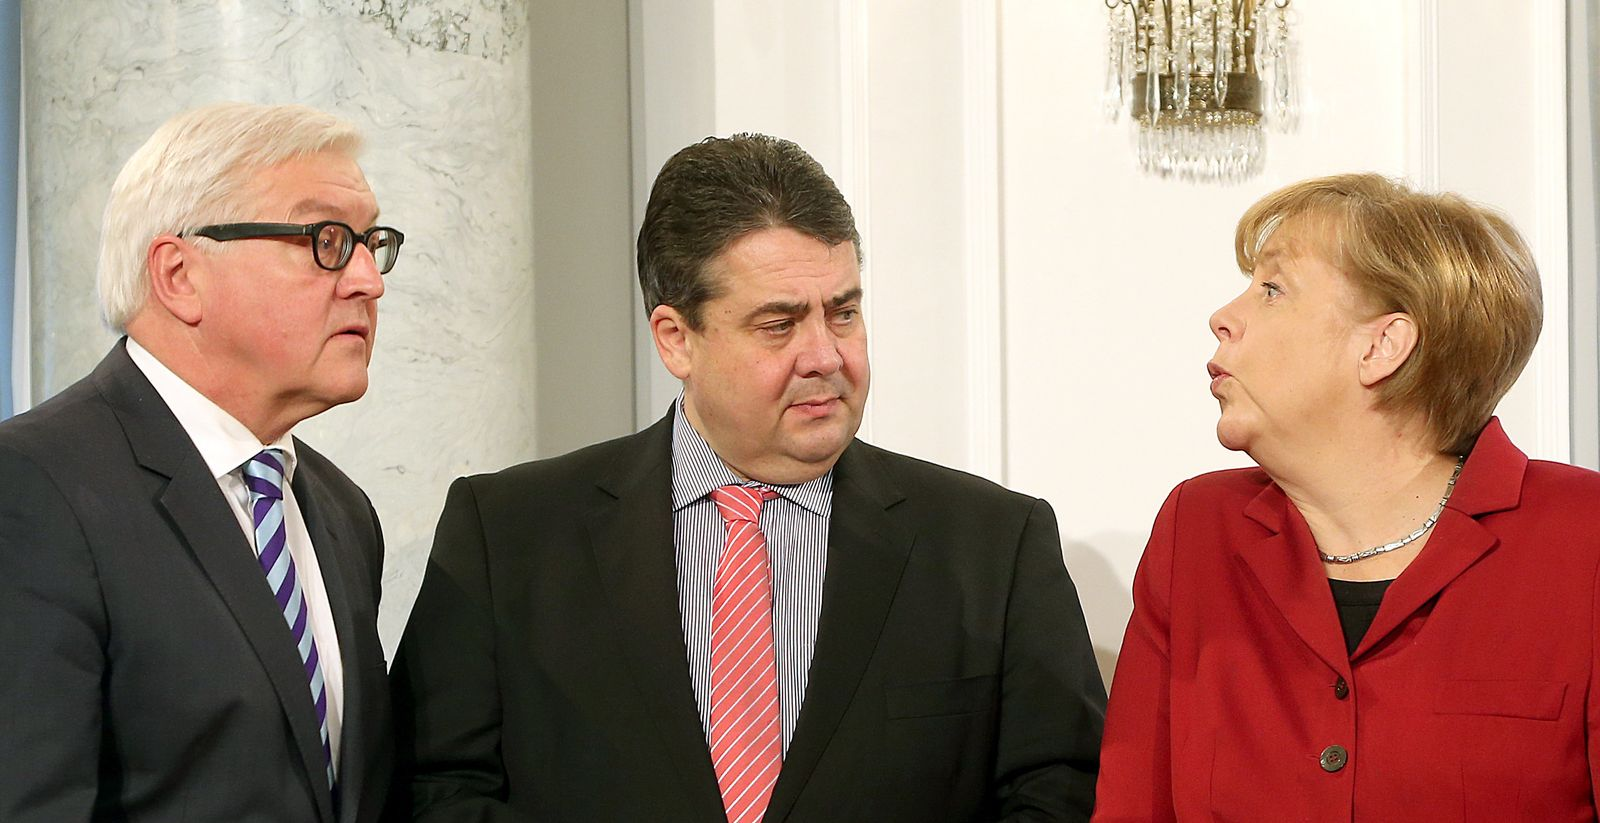 Steinmeier/Gabriel/Merkel